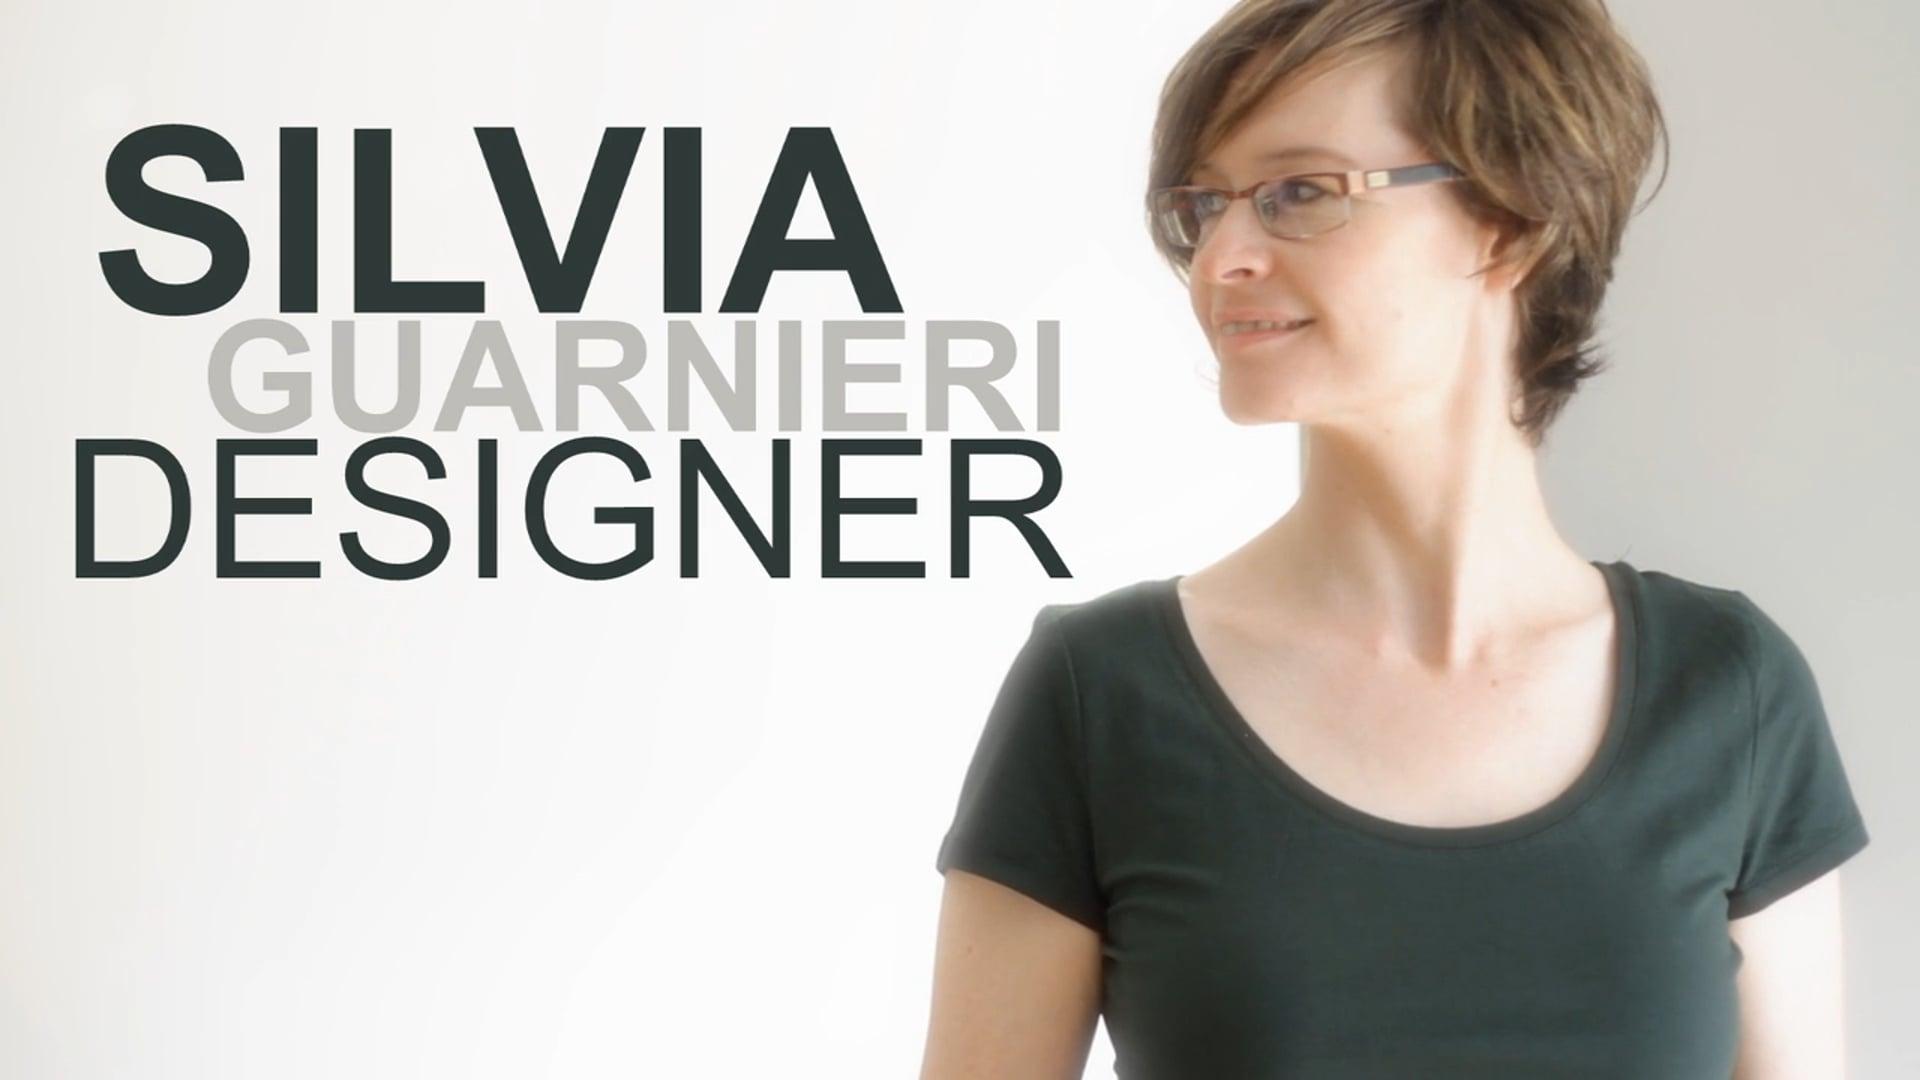 Silvia Guarnieri - Designer